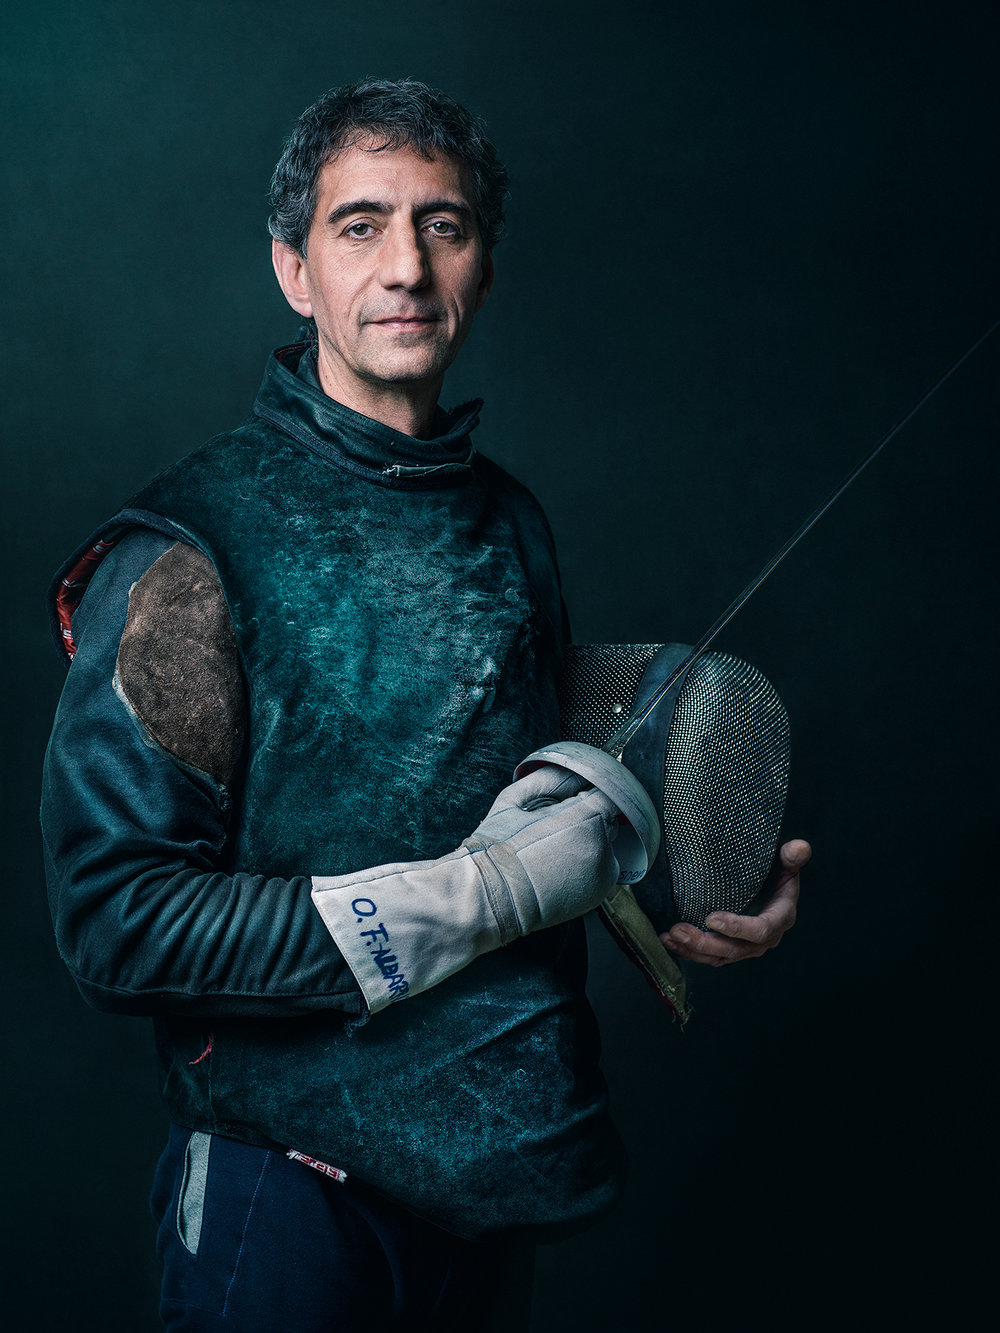 Oscar-arribas-esgrima-maestro-fencing-master-fencer-fechten-scherma-escrime-portrait-fotografo-retrato-photographer019.jpg